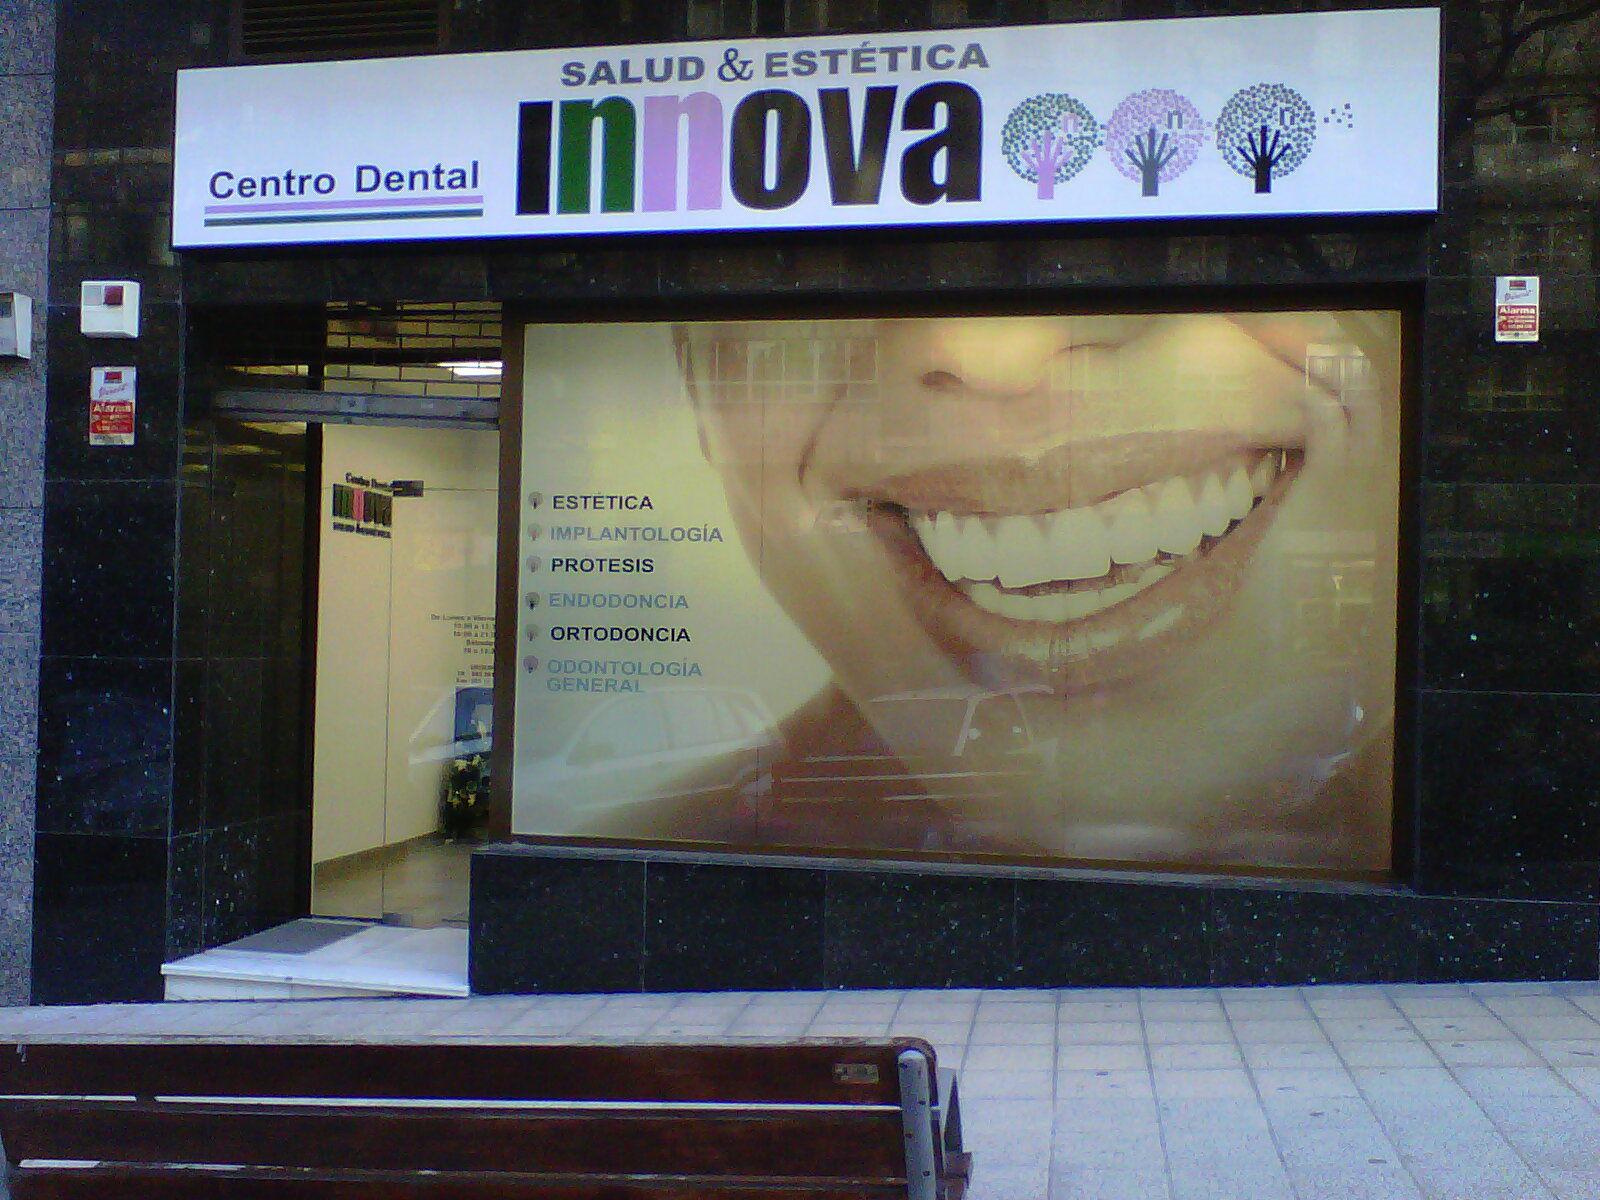 Foto 24 de Dentistas en Avilés | Centro Dental Innova